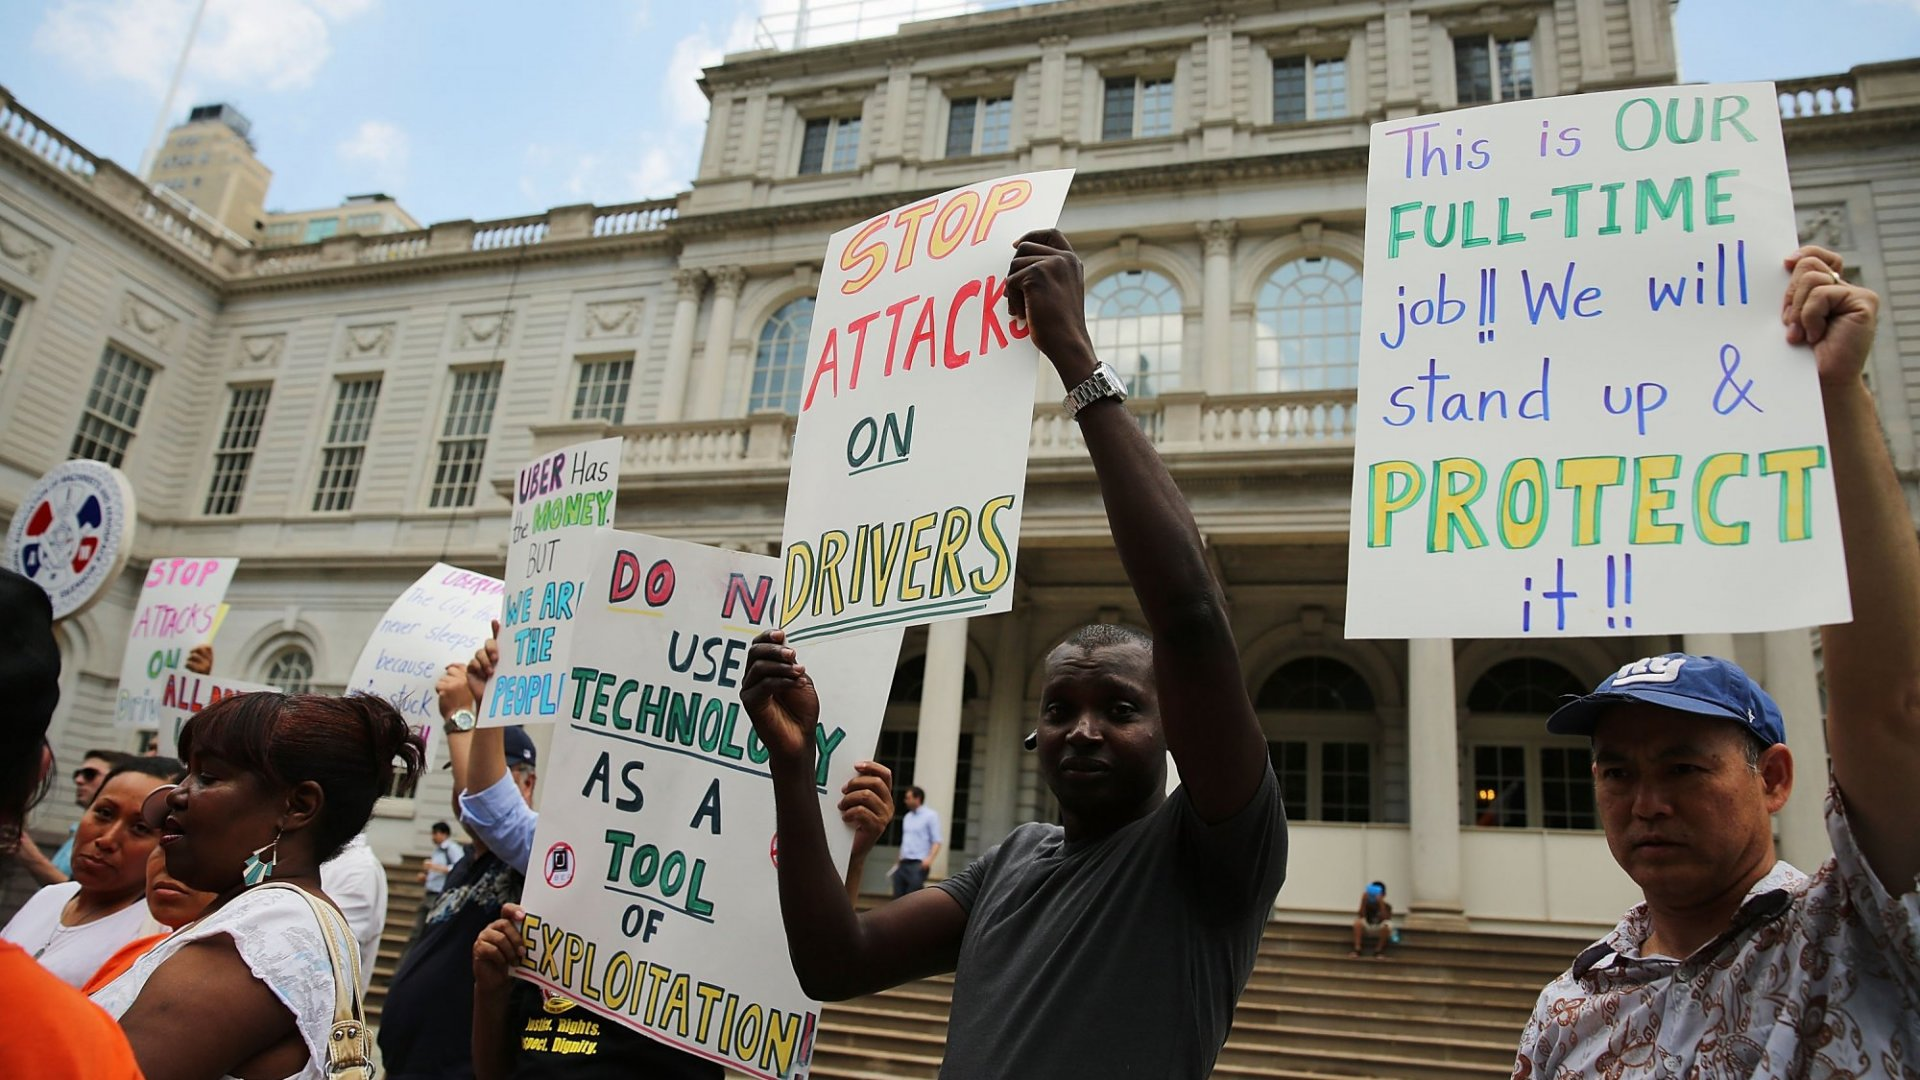 Uber Drivers Union Says N.Y. Mayor Bill de Blasio's Growth Cap Is a Great Idea